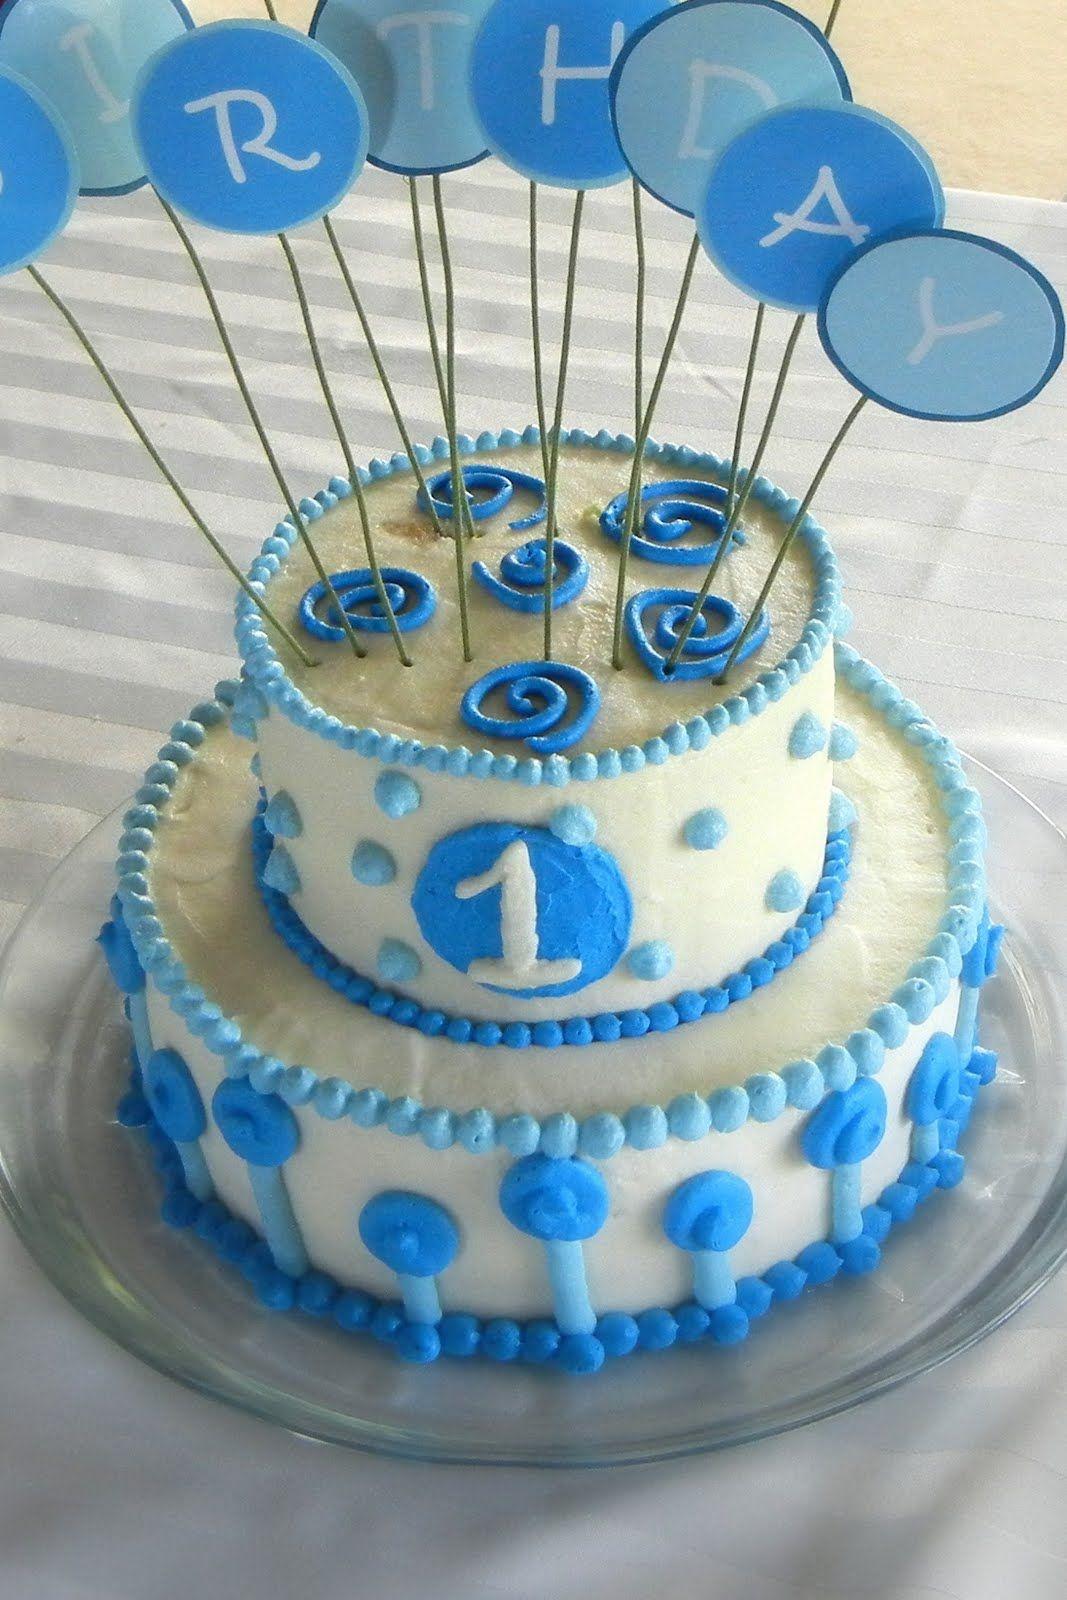 Baby Boy Birthday Cake Ideas Party Cakes Baby Boy 1st